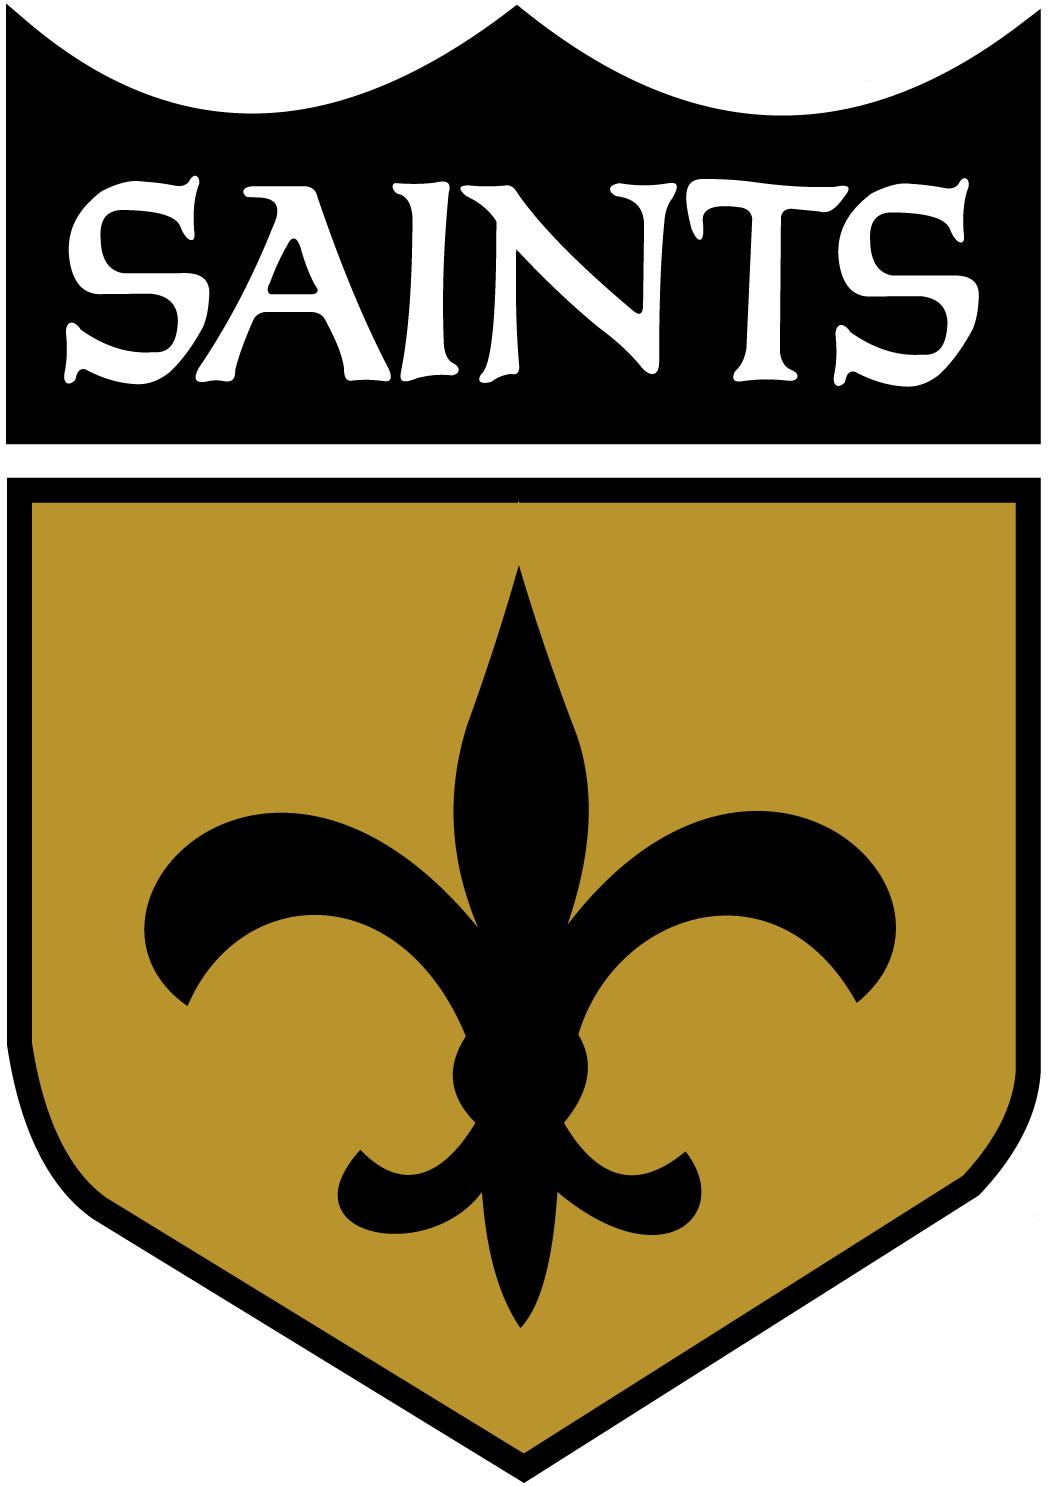 New Orleans Saints Logo Alternate Logo (1967-1984) - Black fleur-de-lis inside black and gold NFL like shield SportsLogos.Net